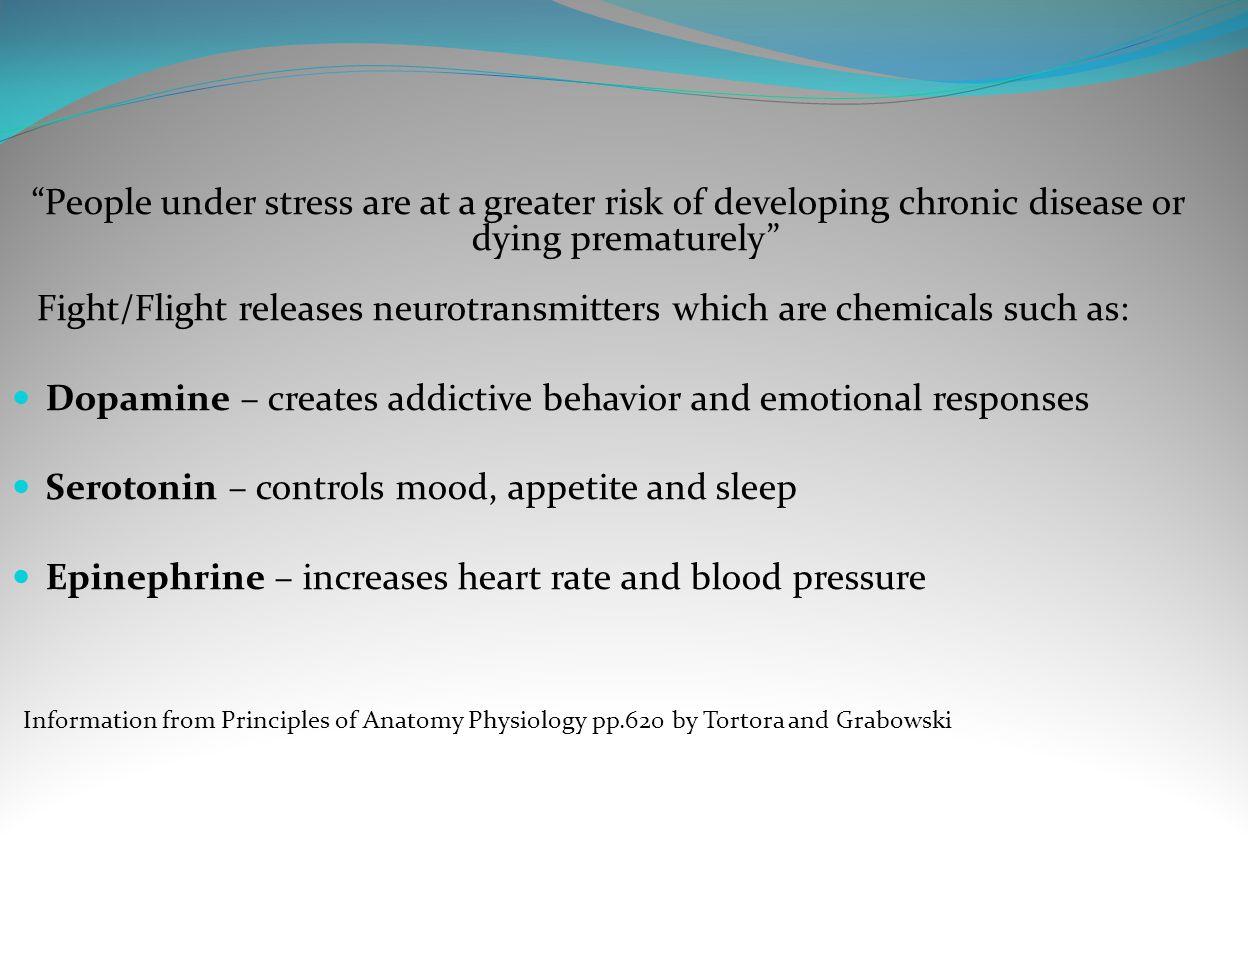 Dopamine – creates addictive behavior and emotional responses